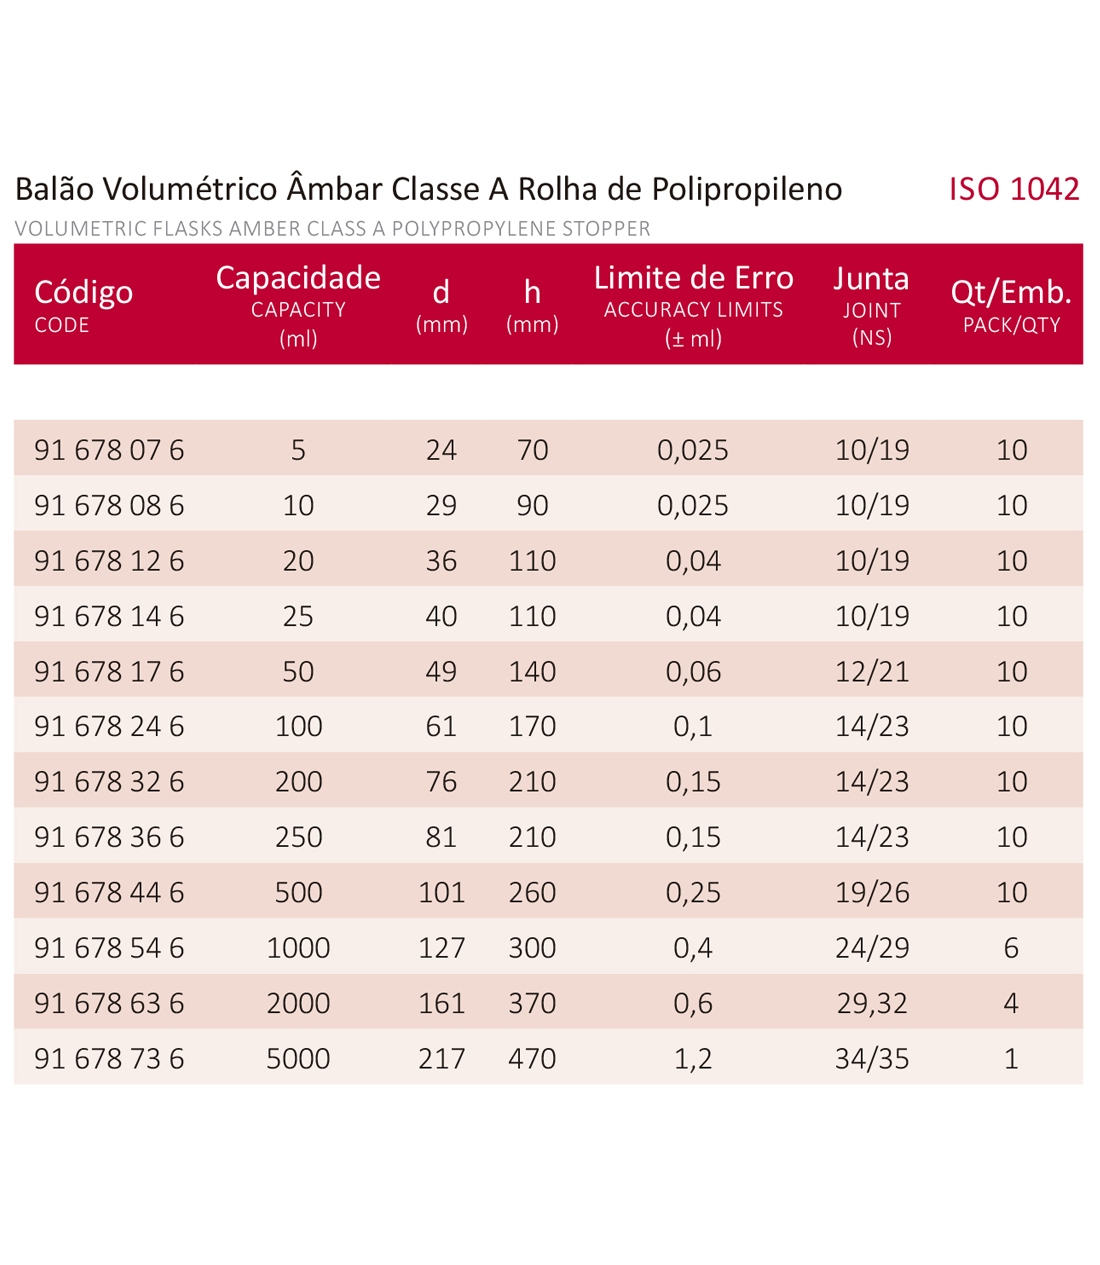 BALÃO VOLUMÉTRICO CLASSE A ROLHA POLI ÂMBAR C/ CERTIFICADO RBC 10 ML - Marca Laborglas - Cód. 91678086-R